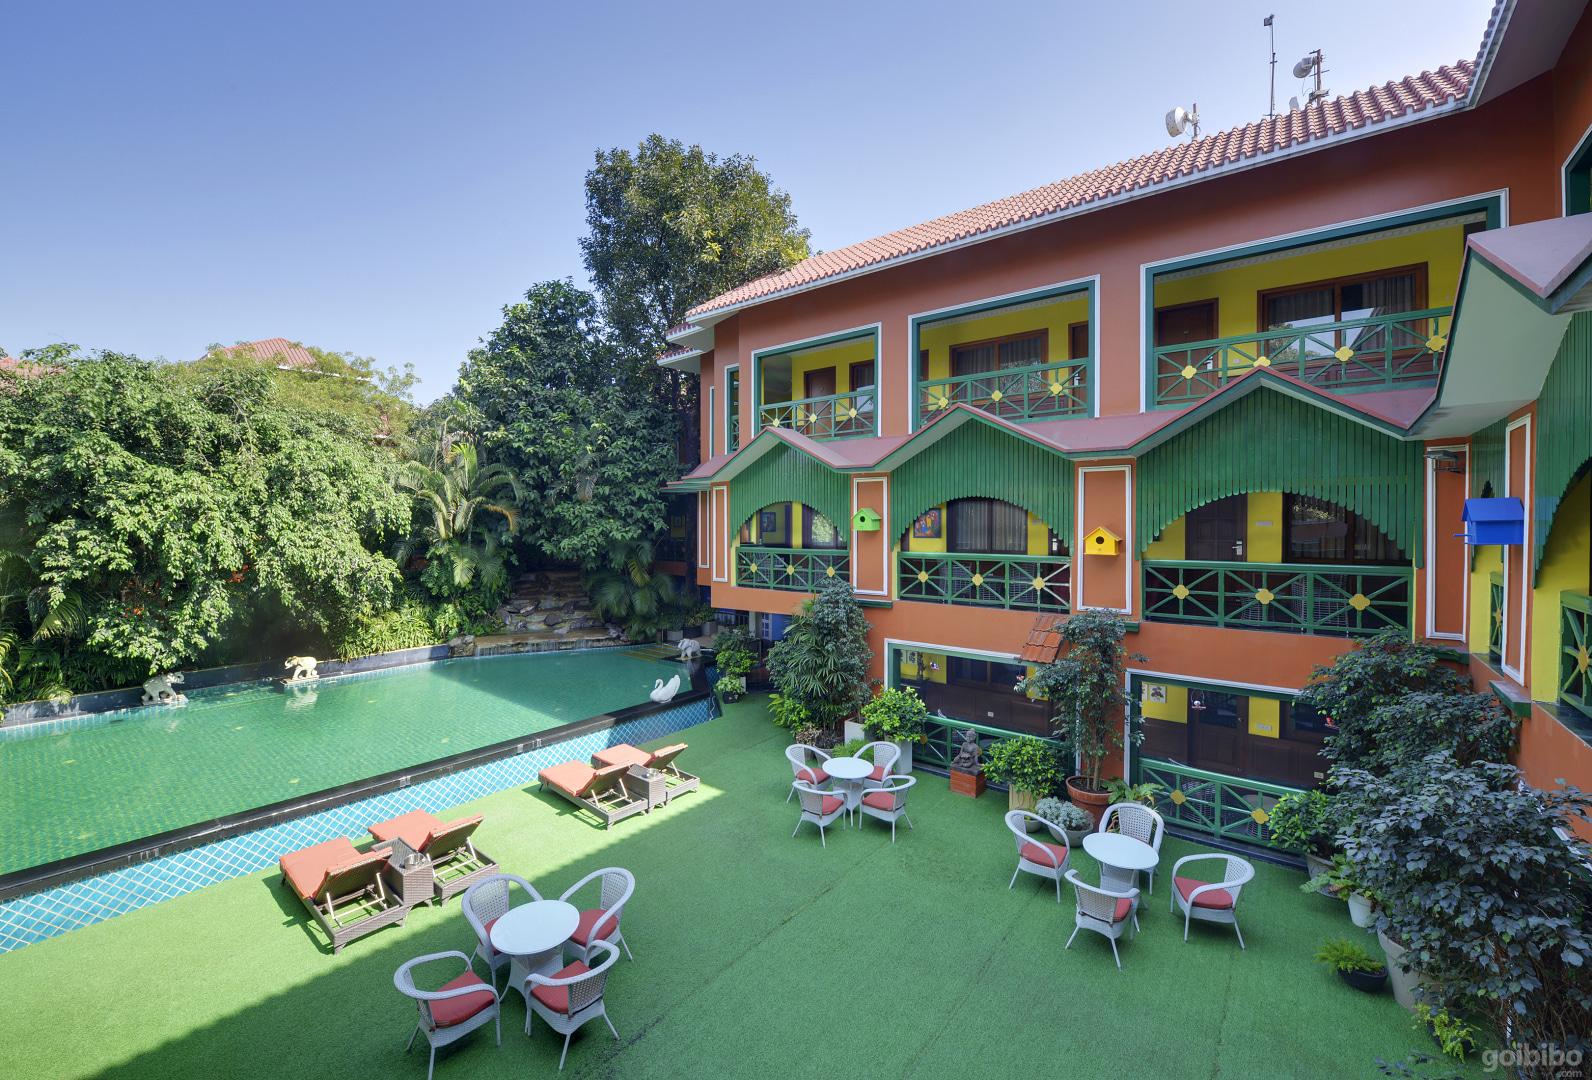 Best Luxury Hotels in Mahabaleshwar - Hotel Mayfair